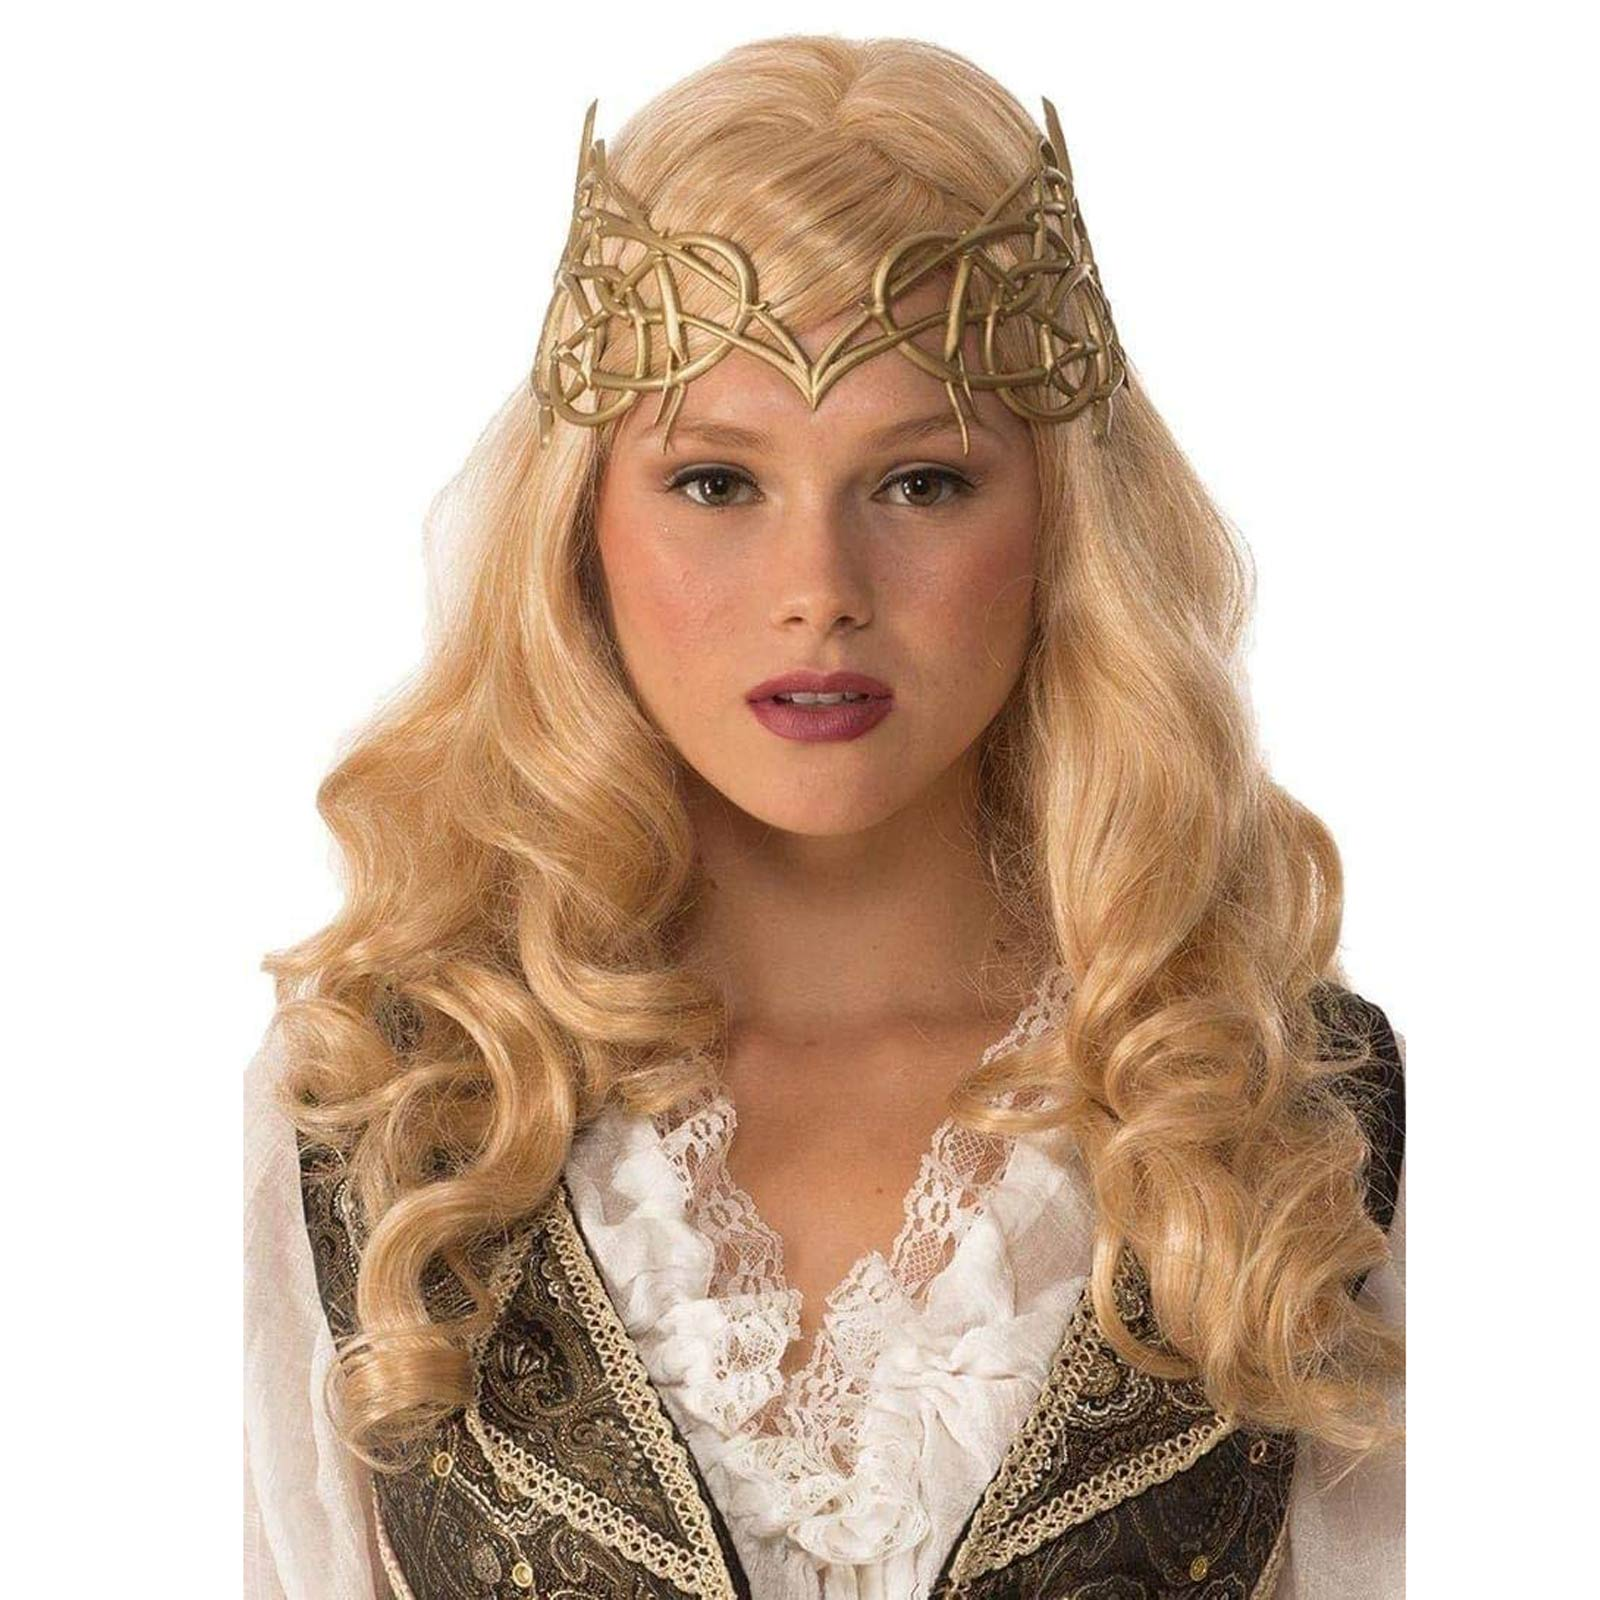 d8f222a5533 Details about Women s Queen Princess Elven Celtic Vine Halloween Costume  Silver Metallic Crown